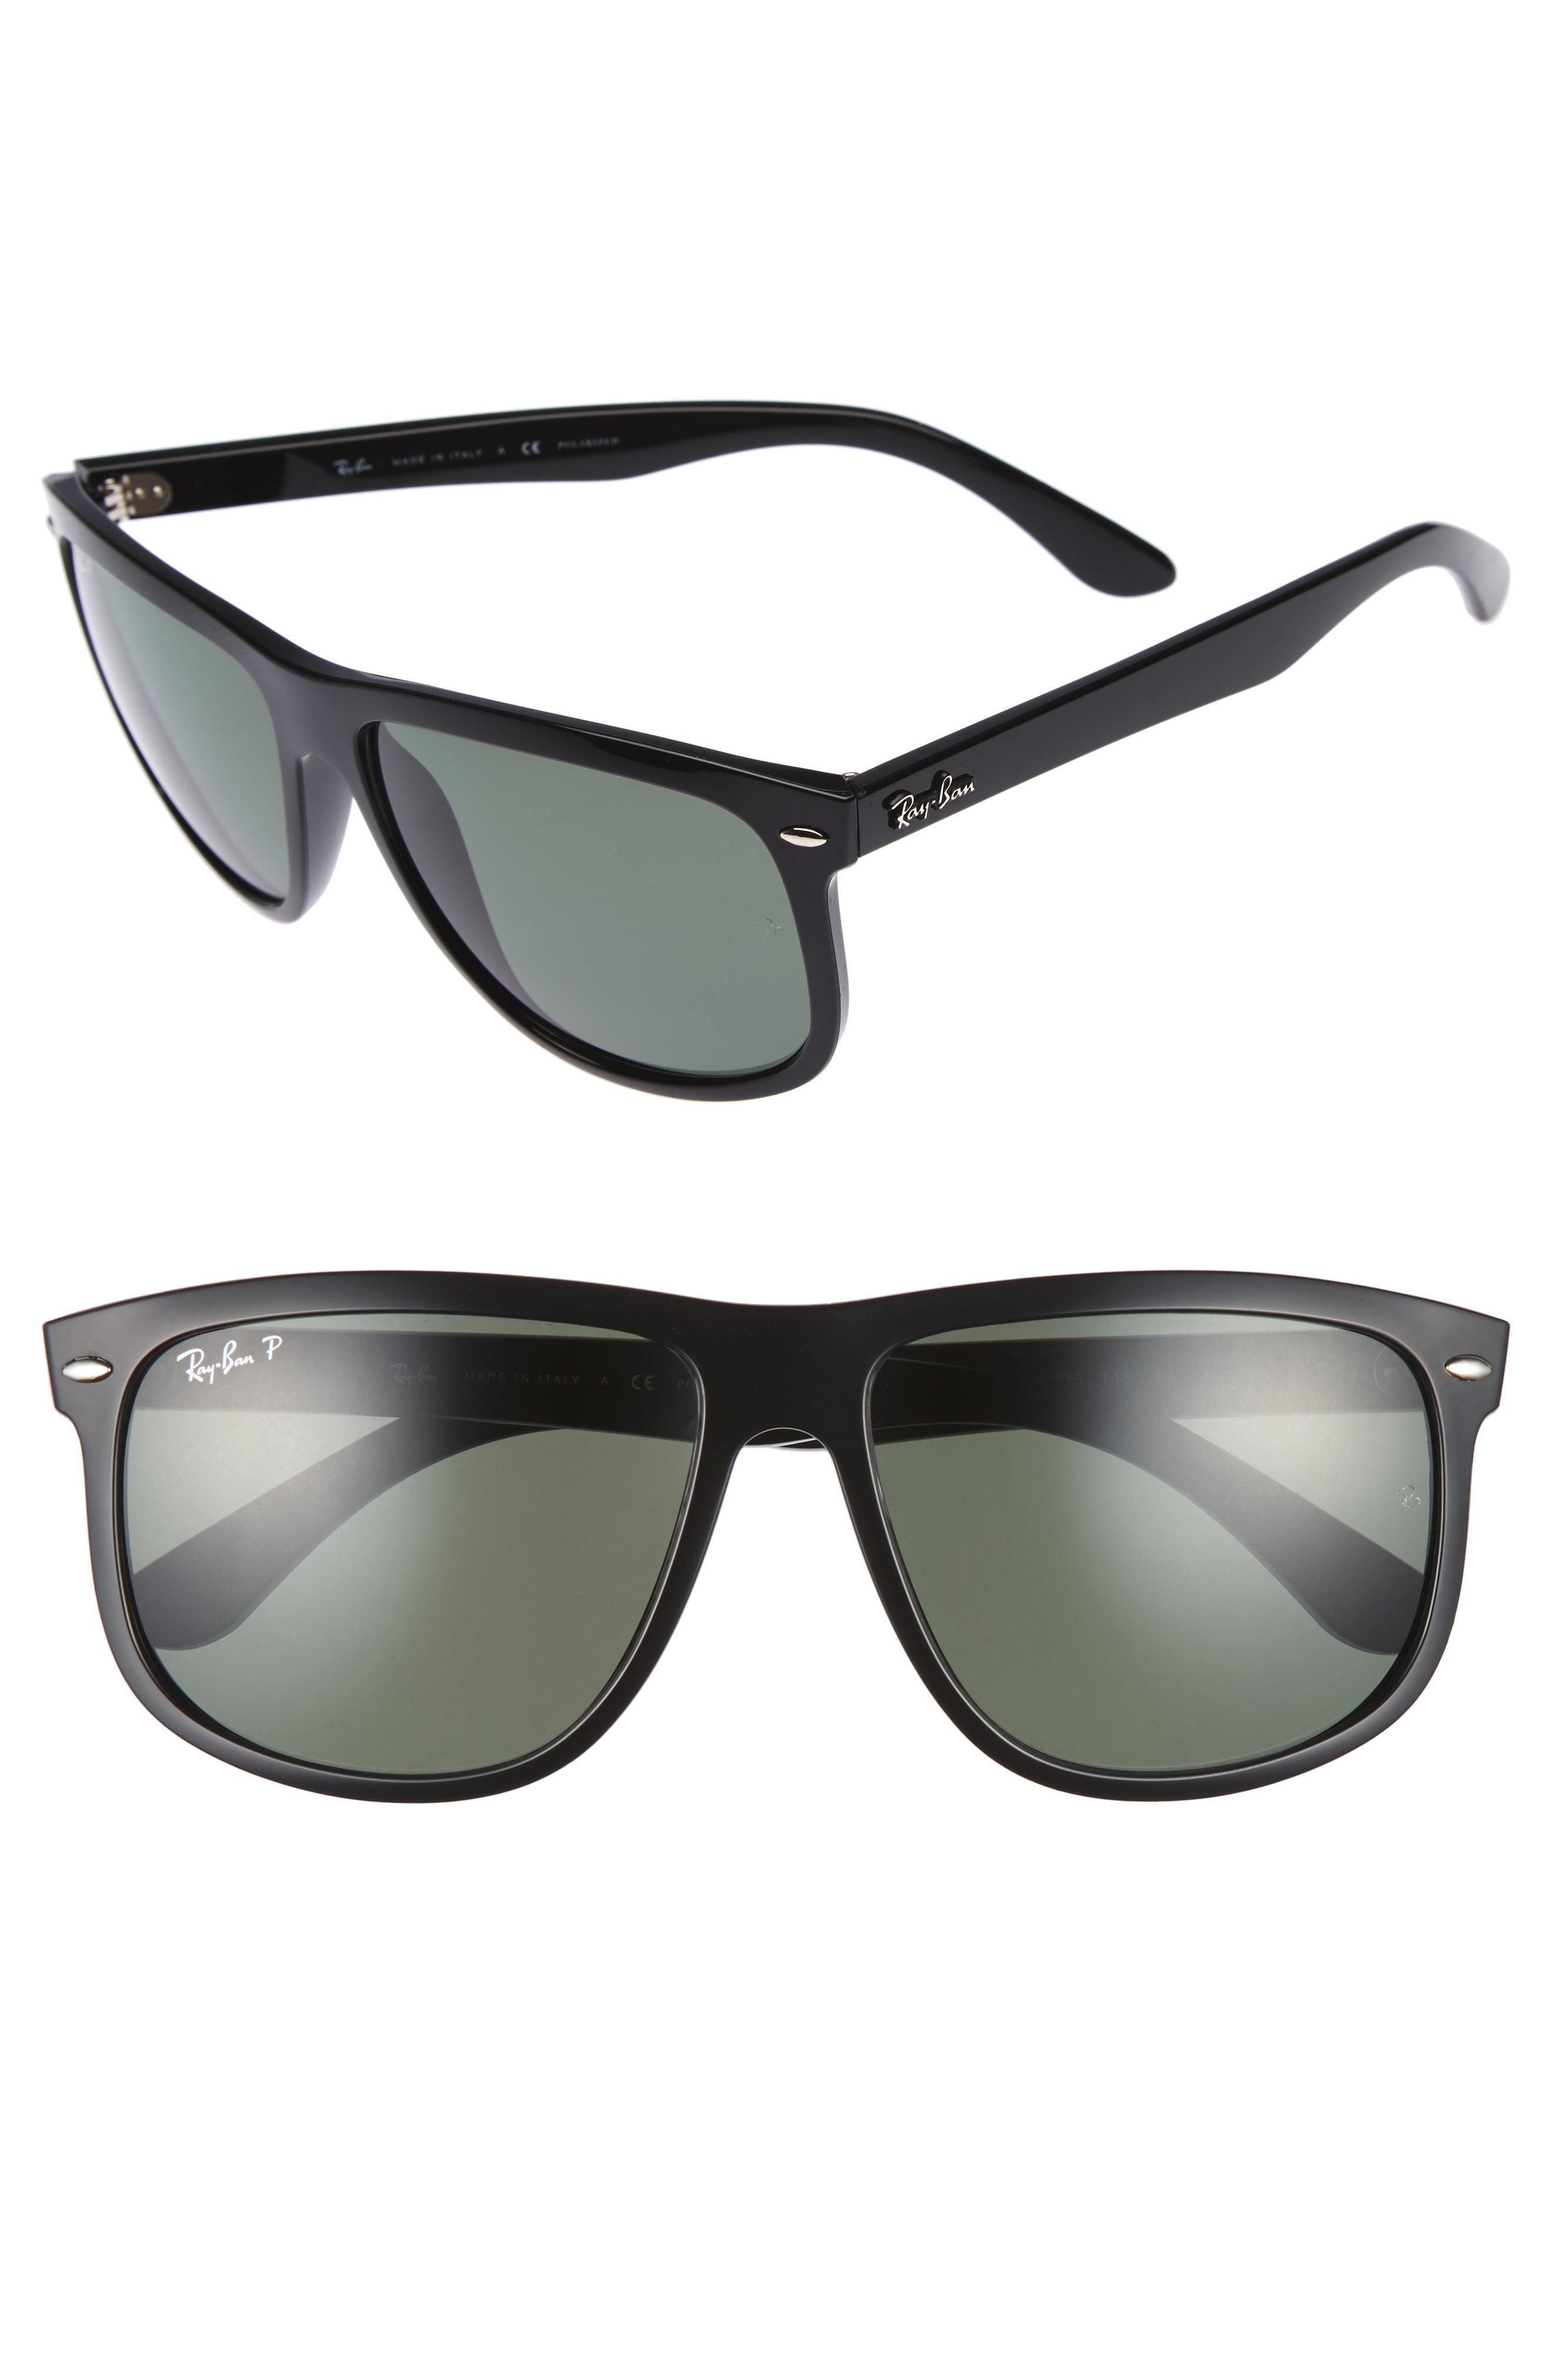 9c94fd3bcd5 Ray-Ban. Men s Black  boyfriend  60mm Polarized Sunglasses - Light Havana  Brown  P